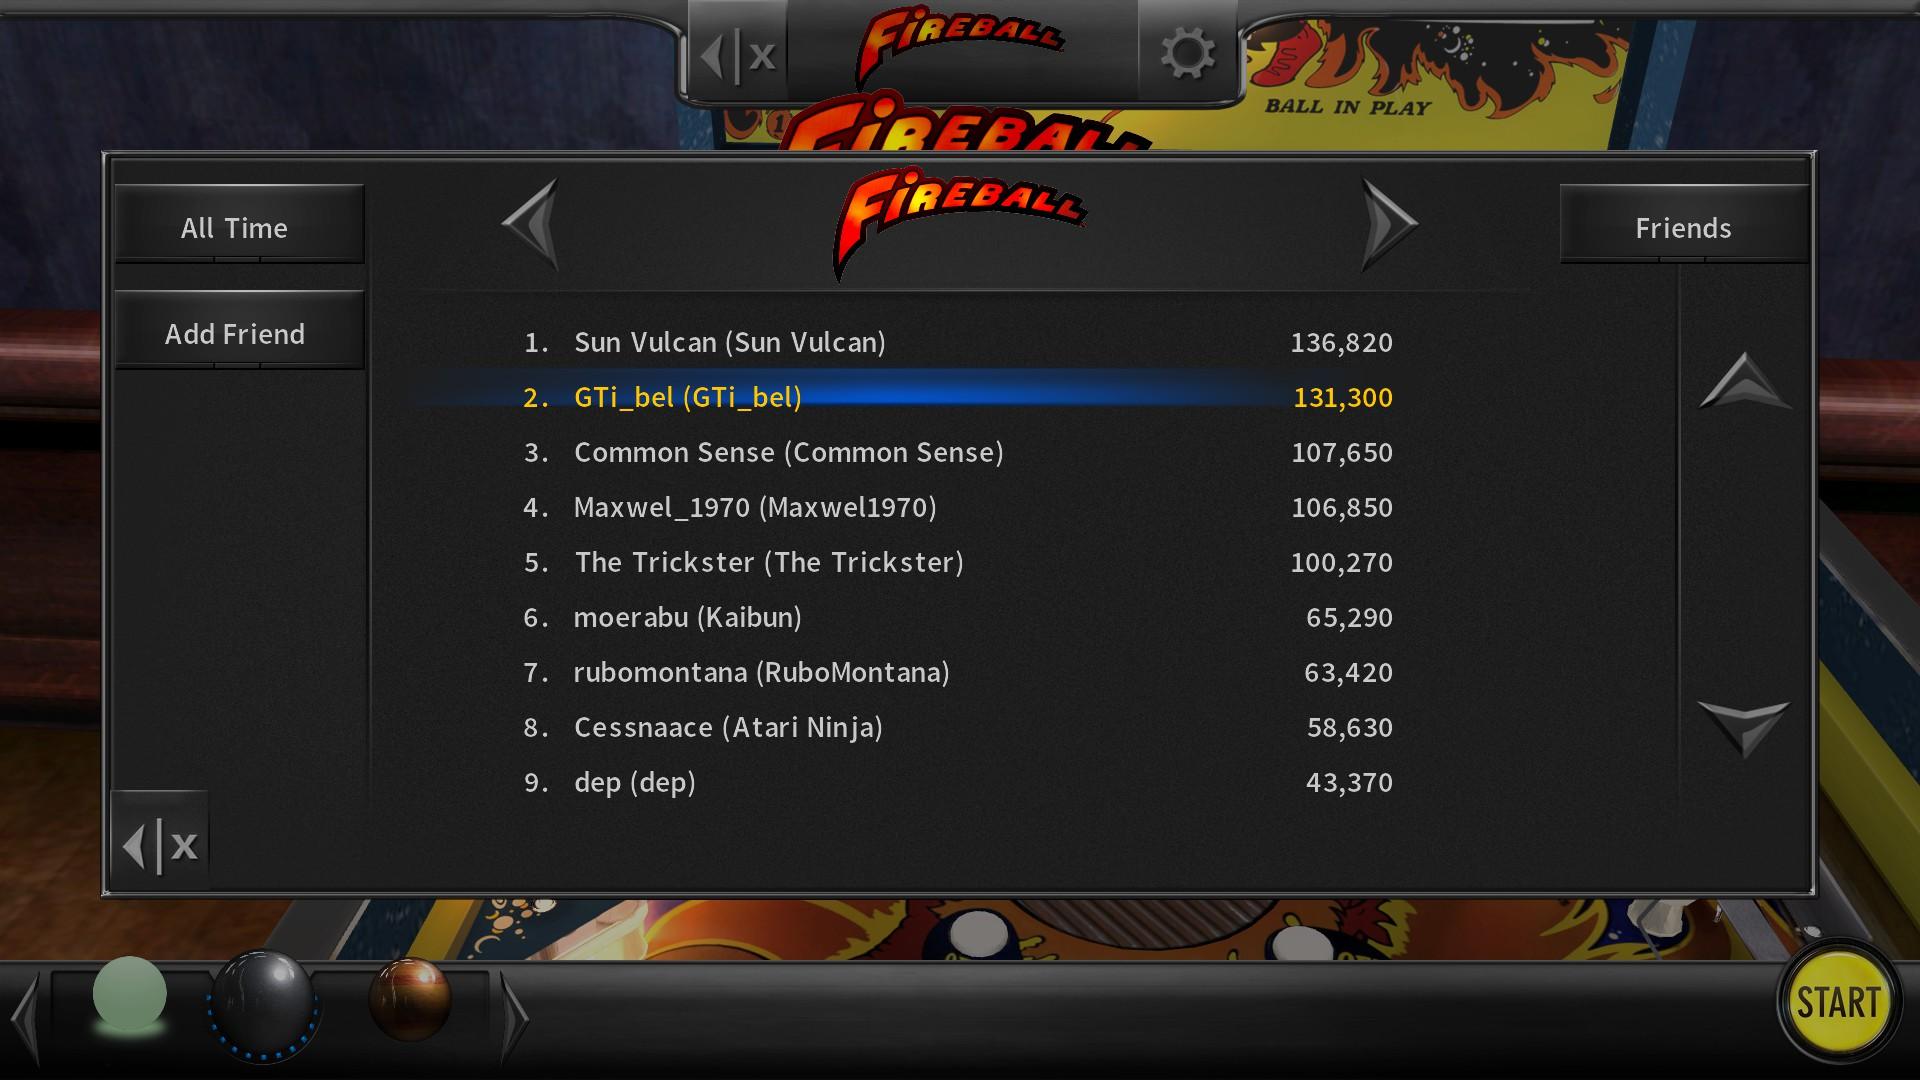 Pinball Arcade: Fireball 131,300 points